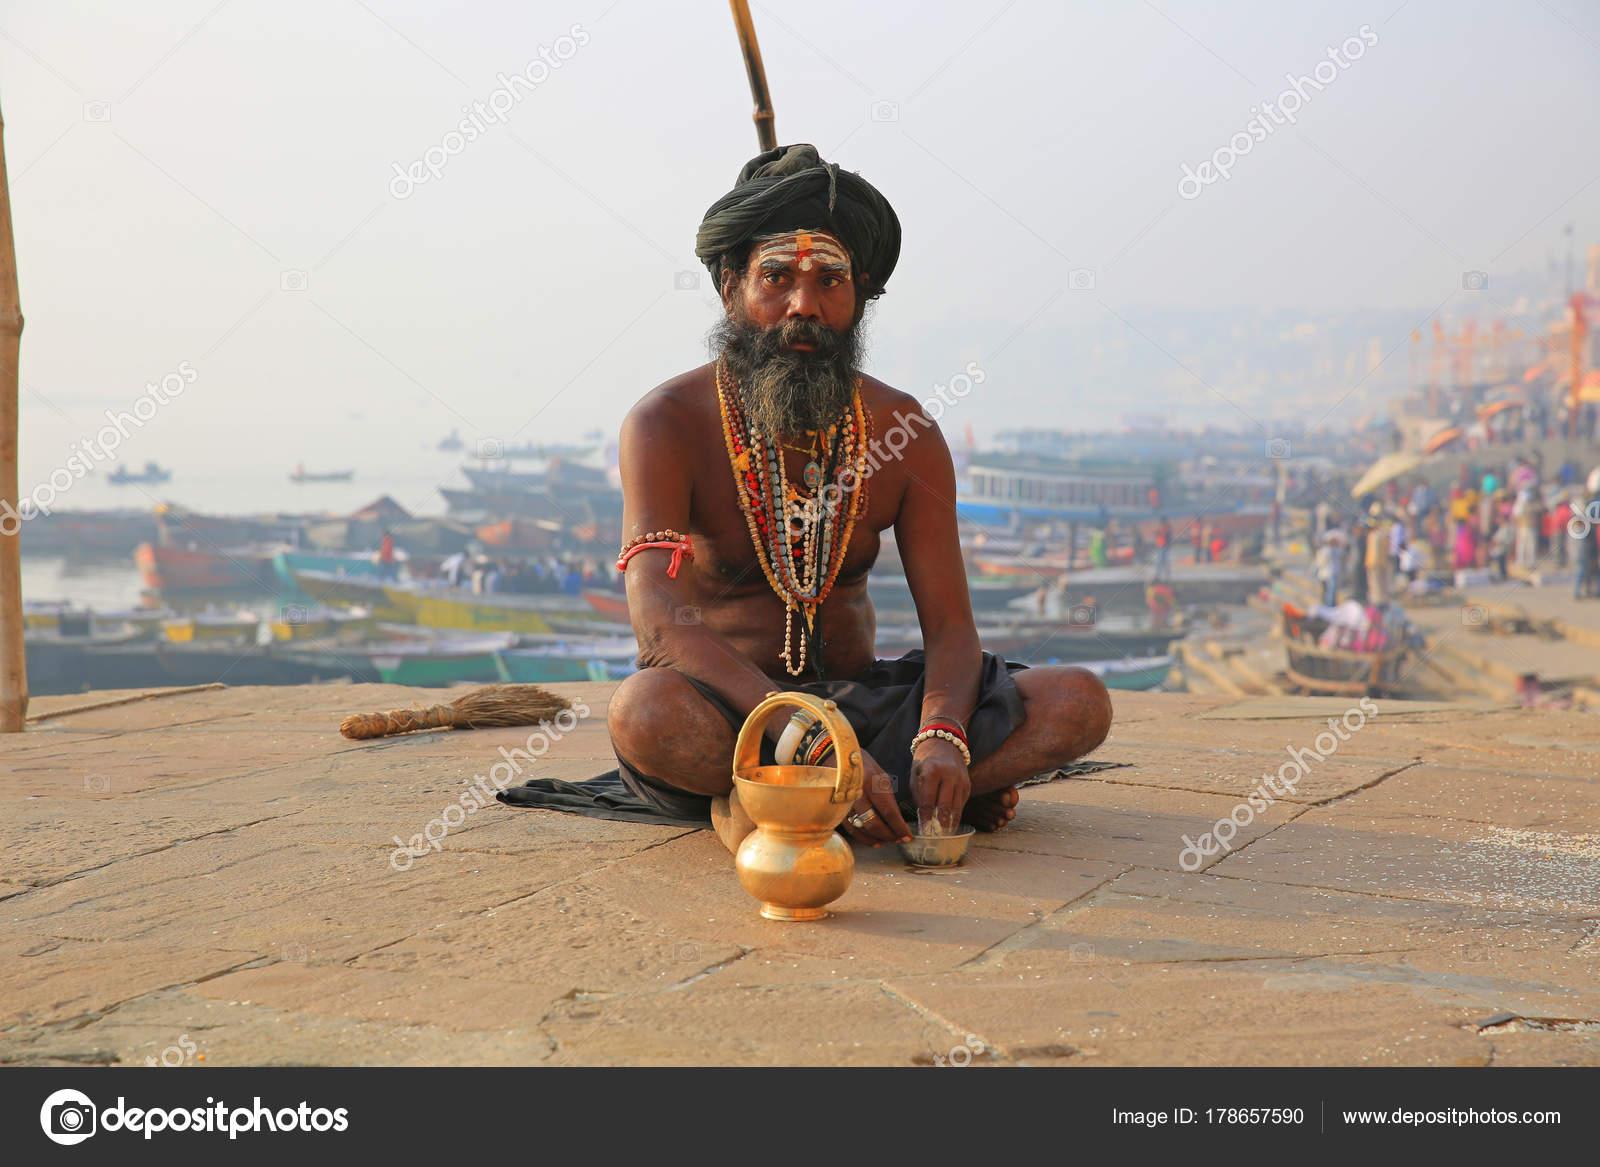 fotografiy-transseksualki-iz-indii-sperma-na-volosatoy-zhope-makro-foto